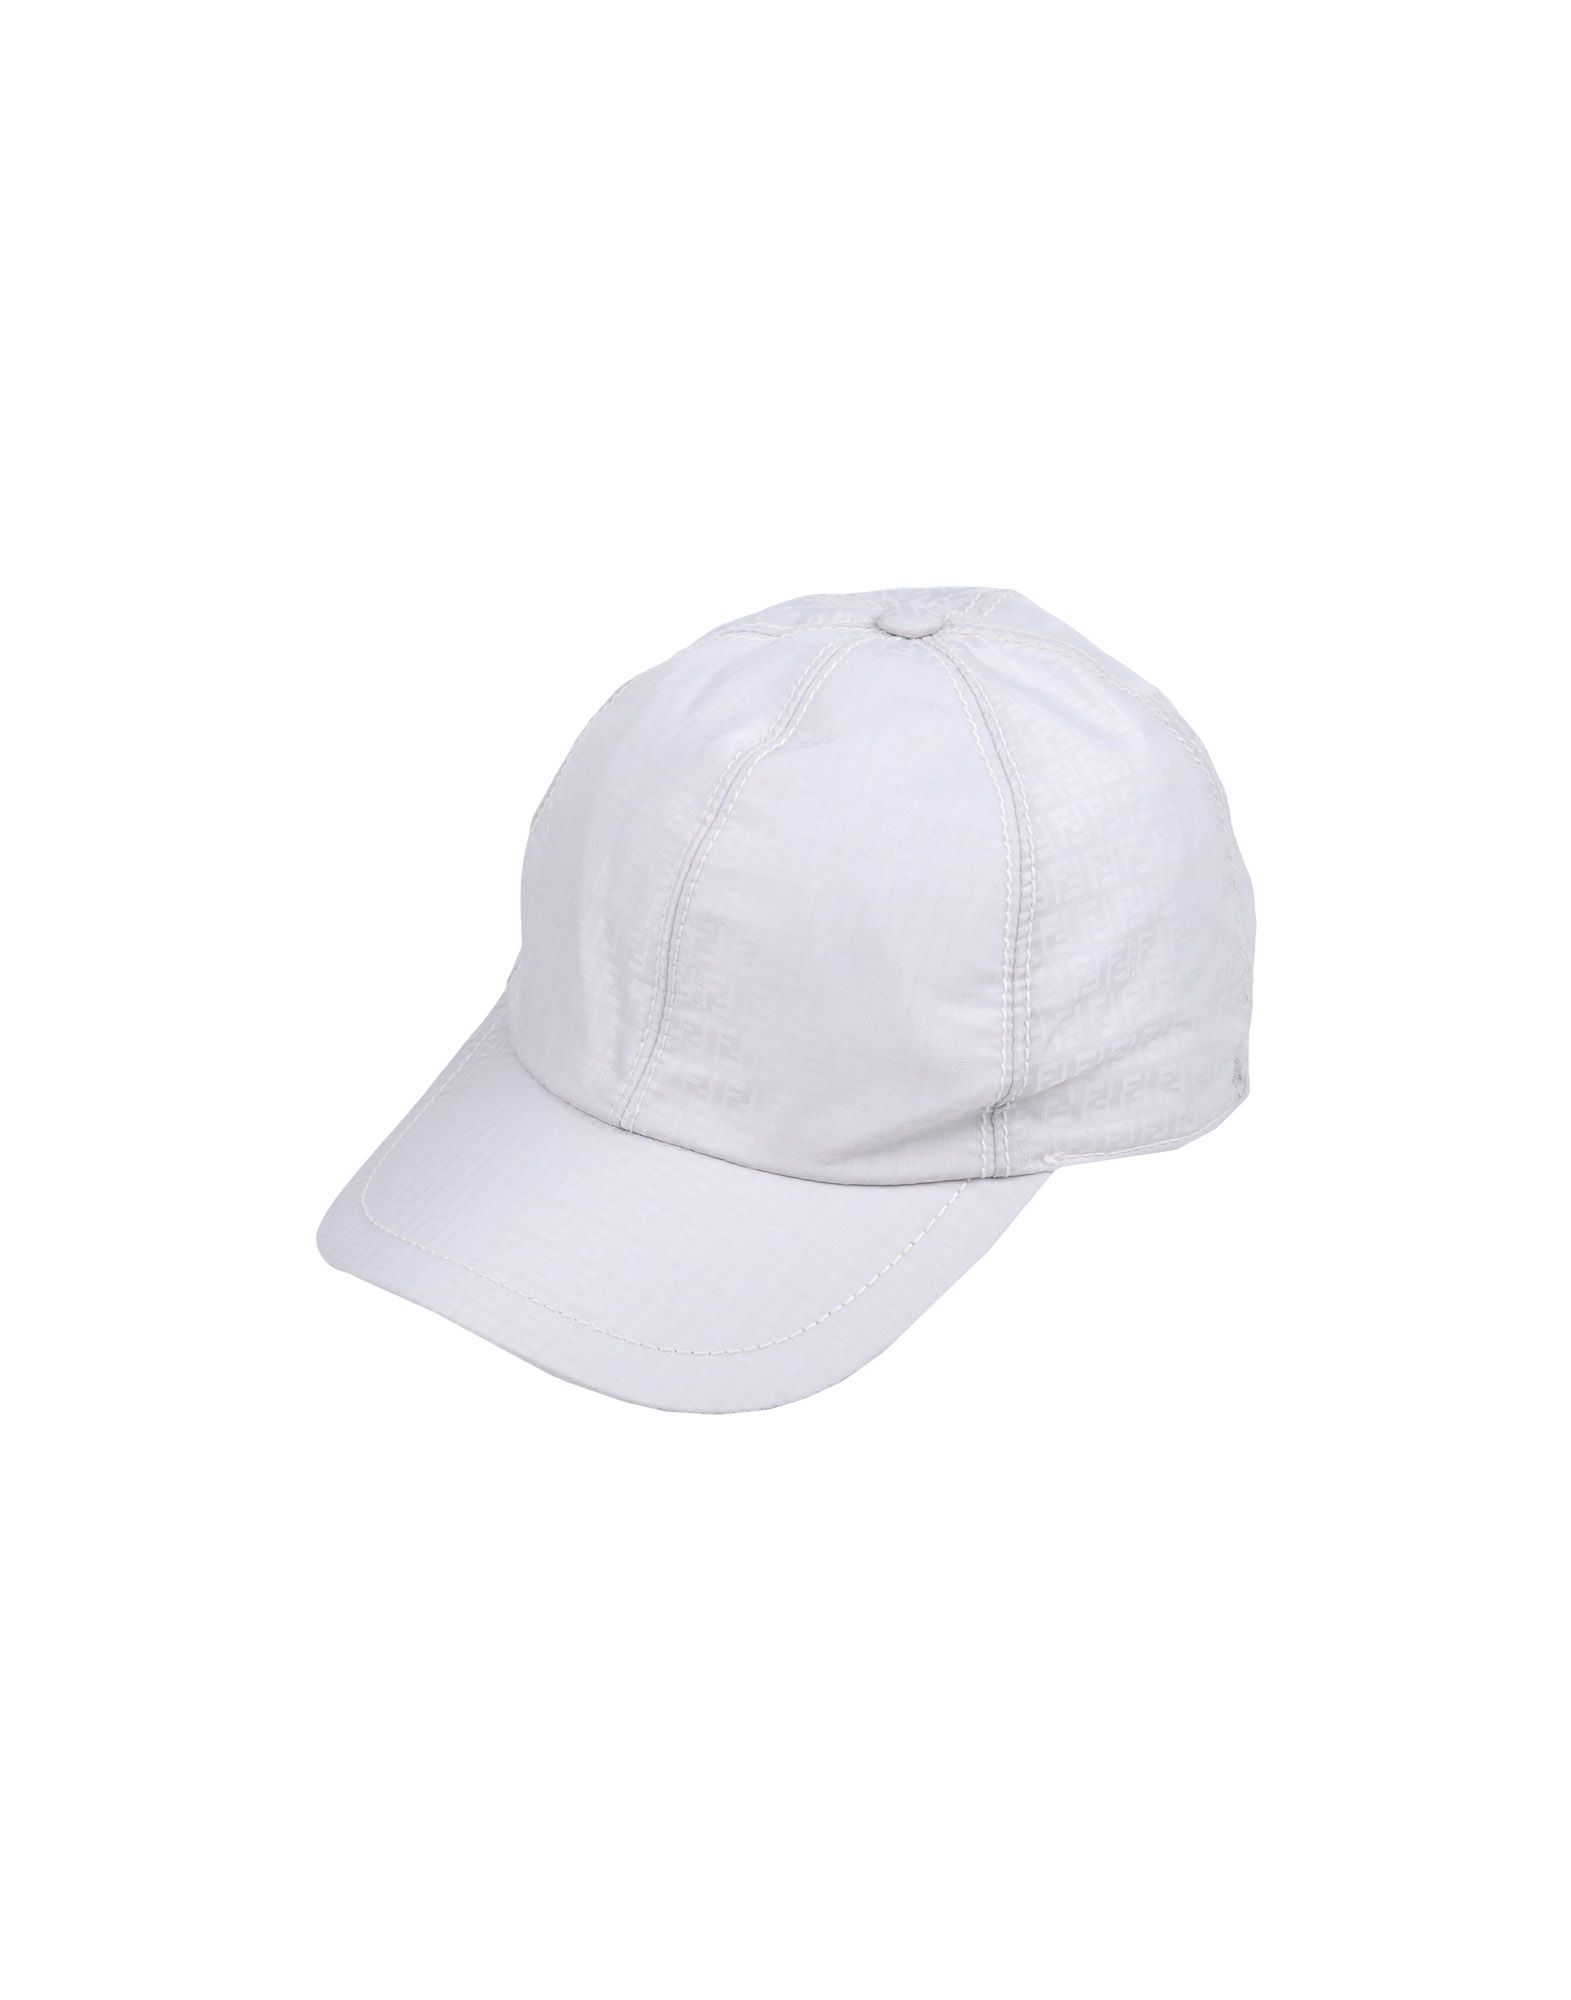 FENDI | FENDI Hats 46549388 | Goxip